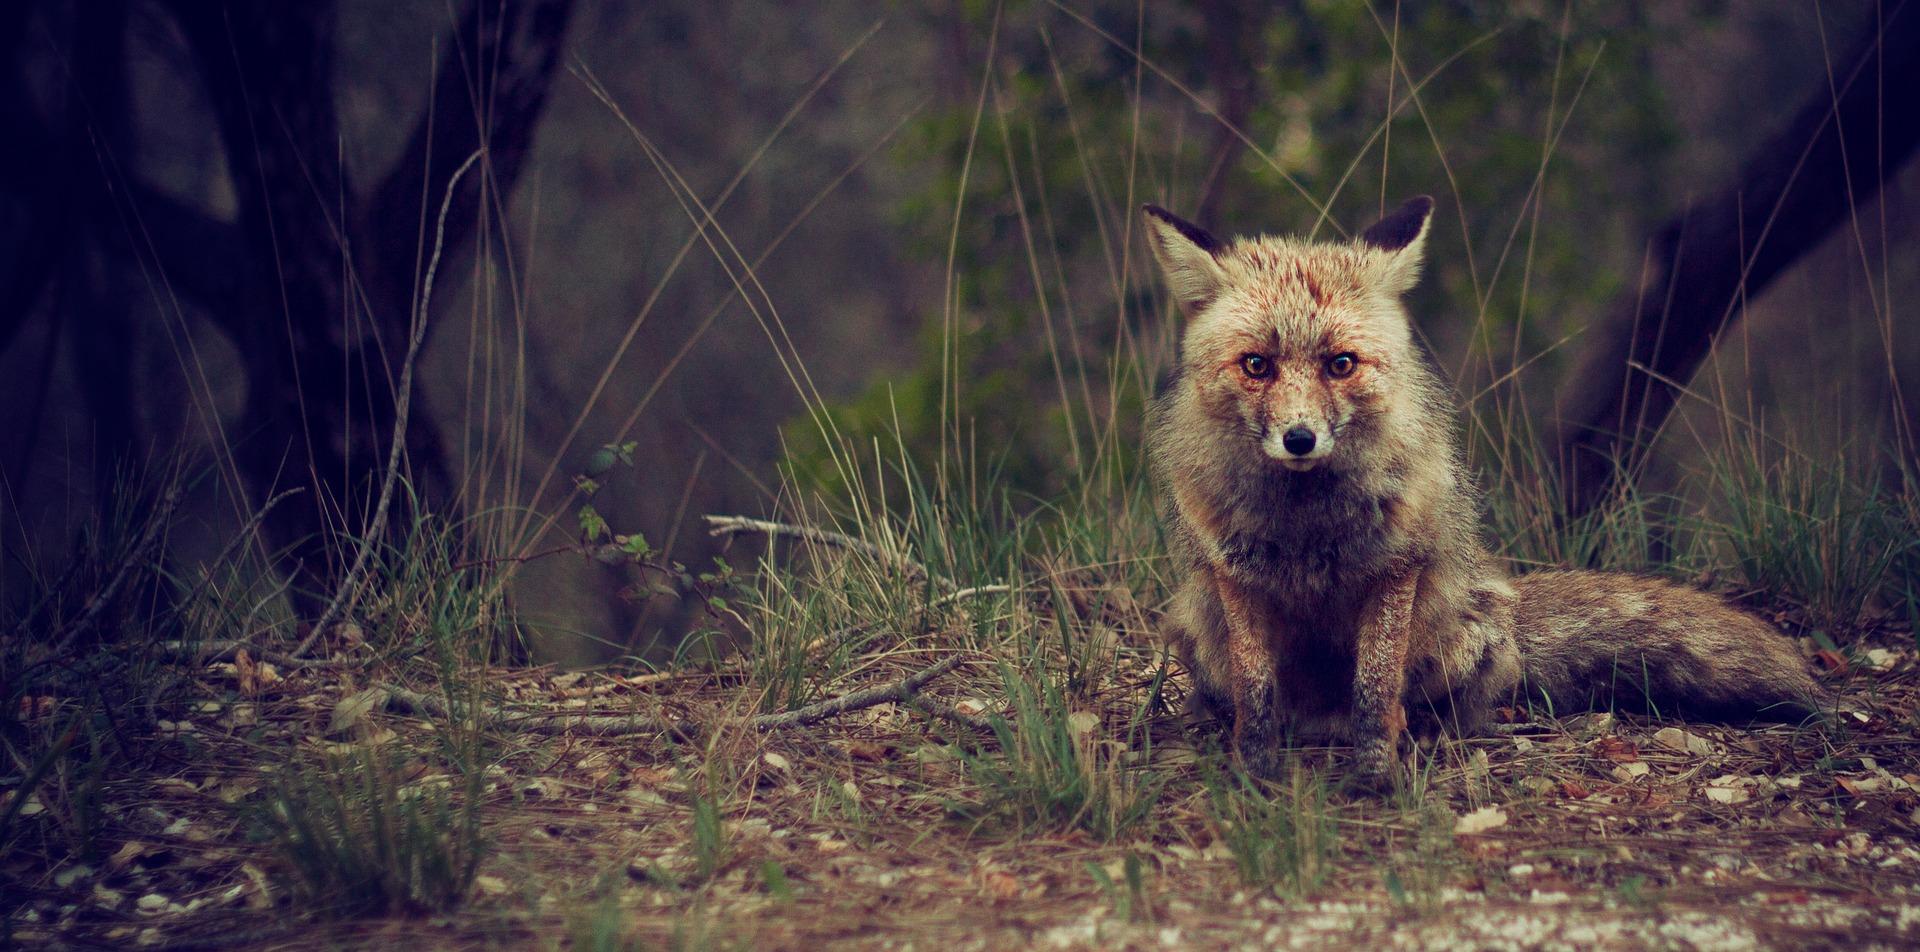 Blog browning : La gestion des nuisibles au Royaume-Uni (renard, lapin)